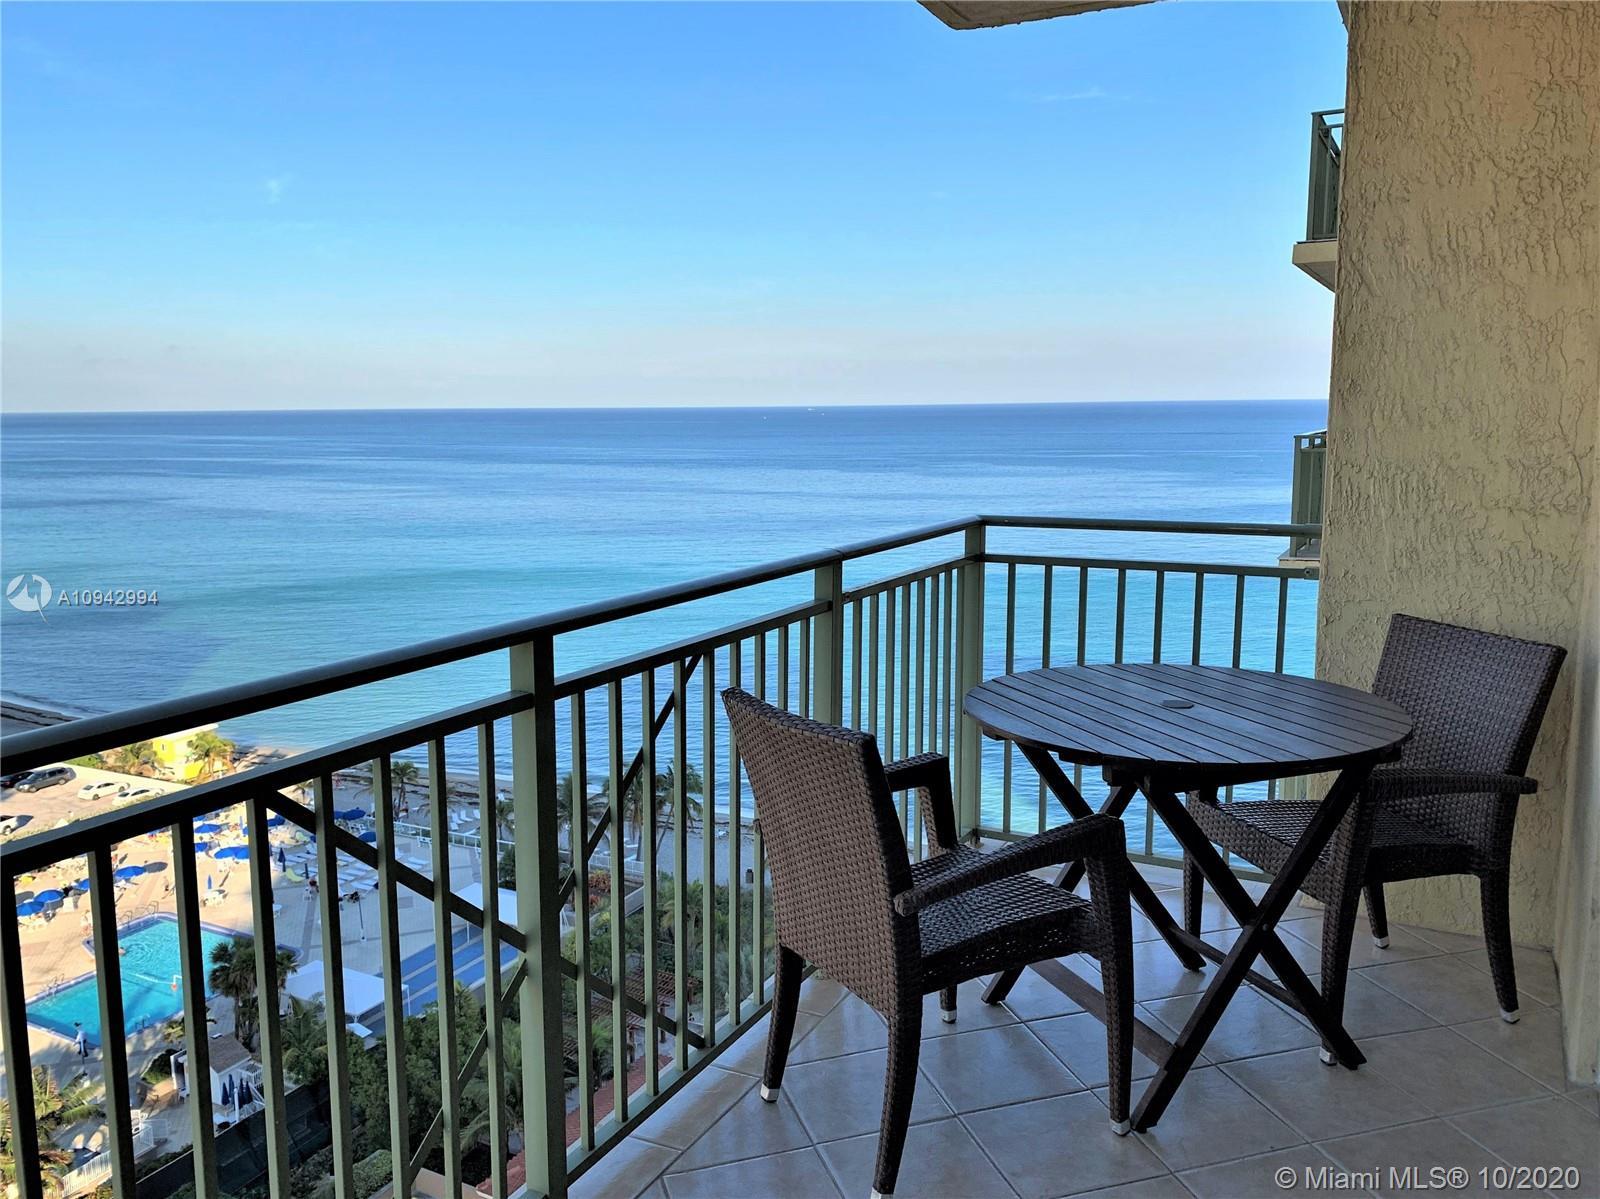 2080 Hallandale #1506 - 2080 S Ocean Drive #1506, Hallandale Beach, FL 33009